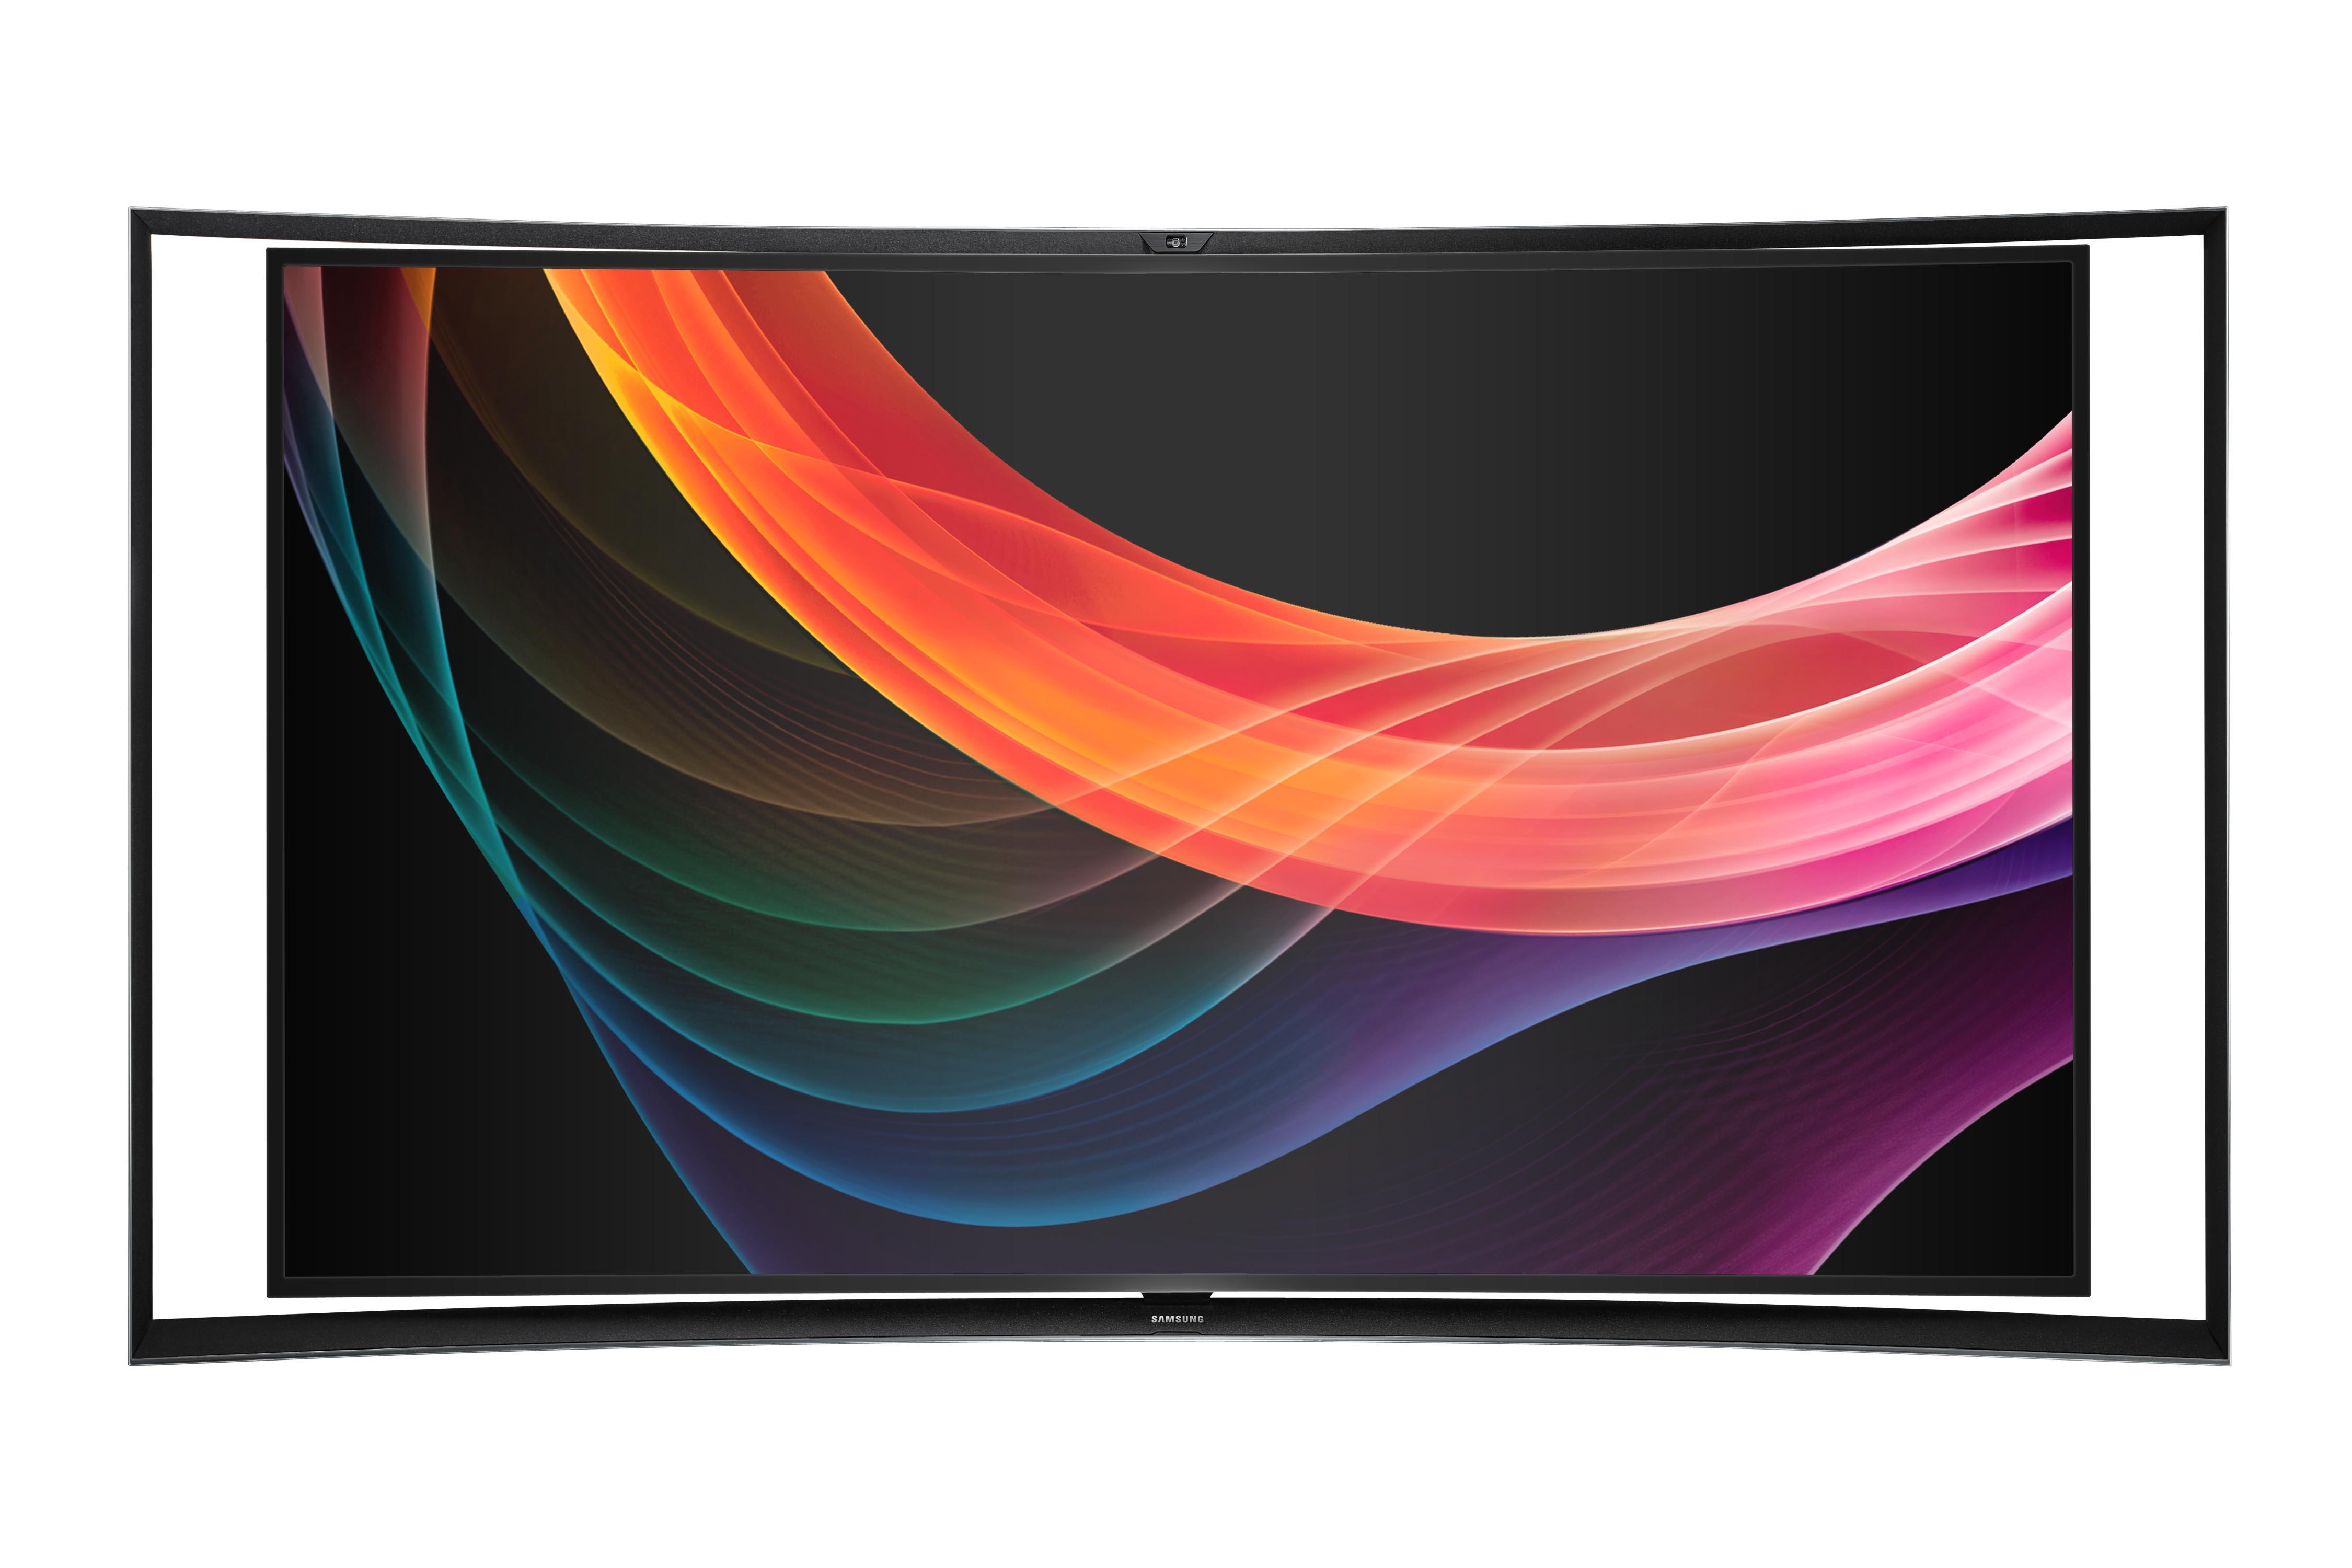 File:Samsung OLED TV.jpg - Wikimedia Commons